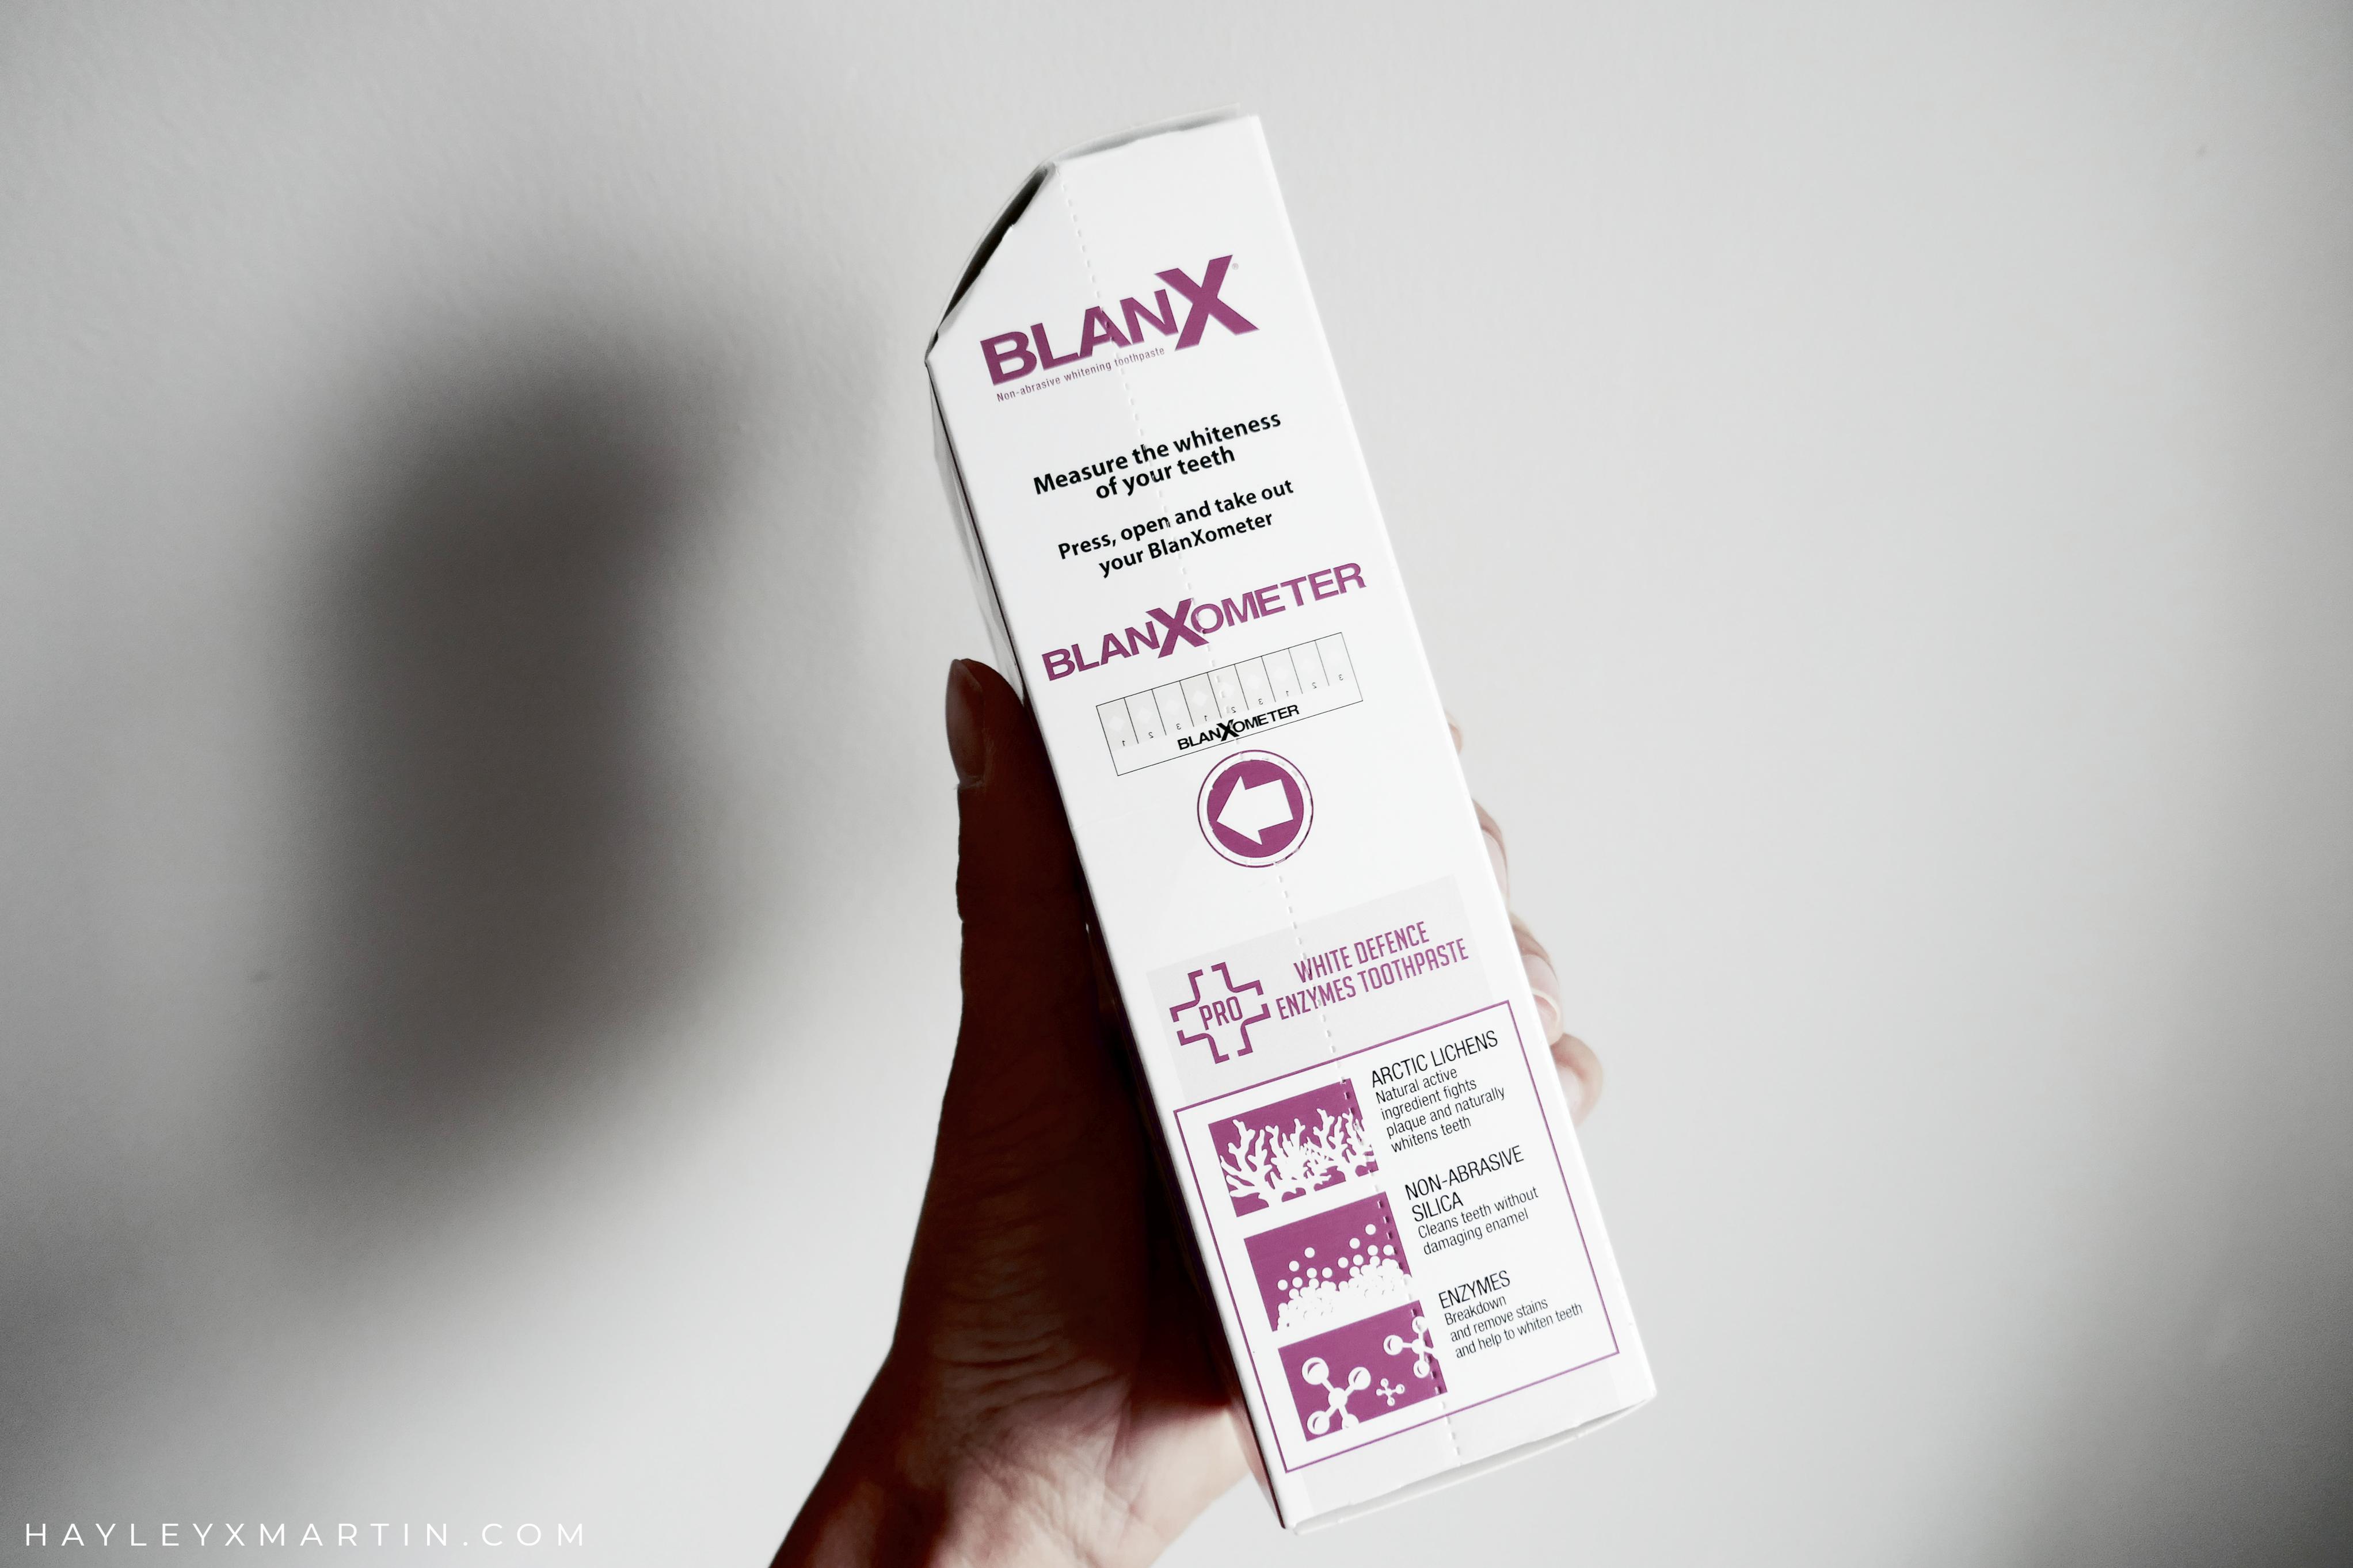 HAYLEYXMARTIN _ BLANX PRO GLOSSY WHITE REVIEW BLANXOMETER